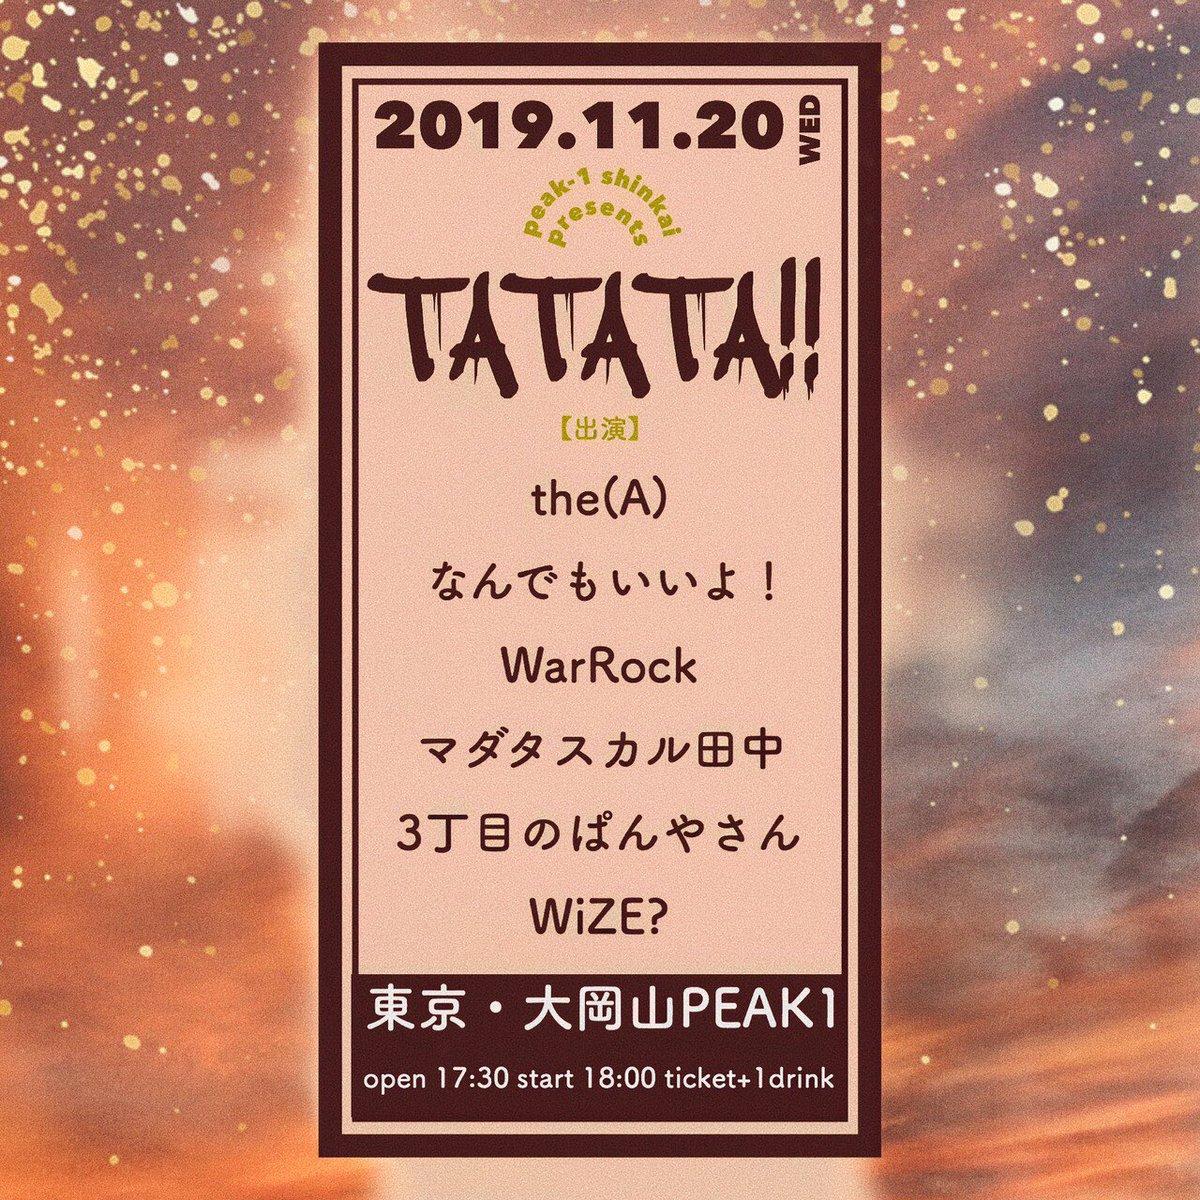 RT @3choume_pannya: 🌱11月20日の水曜日にTATATAにぱんや出ます!! 大岡山のpeak-1でやります! 出番は18:35から! 取り置きの連絡待ってます🥐🍞 https://t.co/AmRNYOTf0t